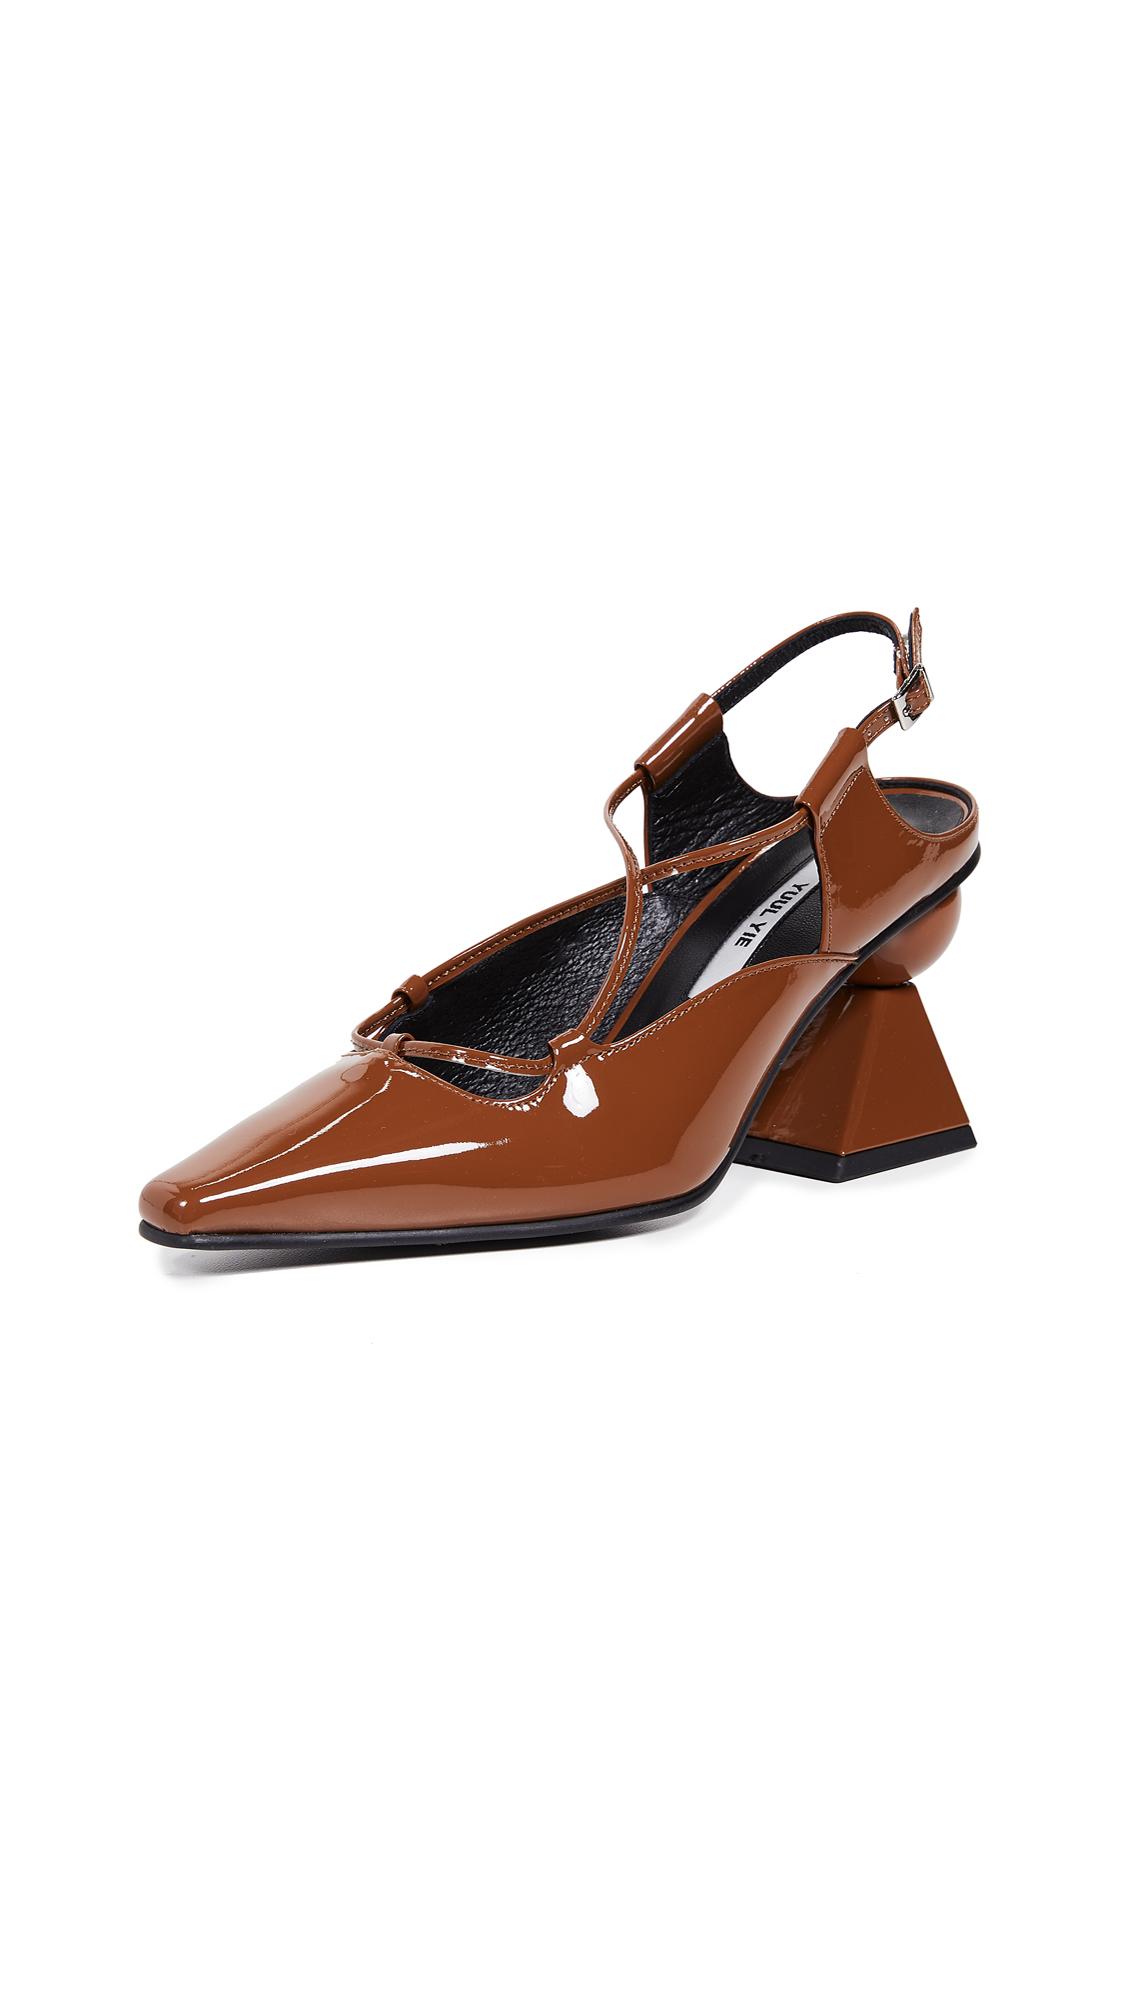 Yuul Yie Coy Sandals